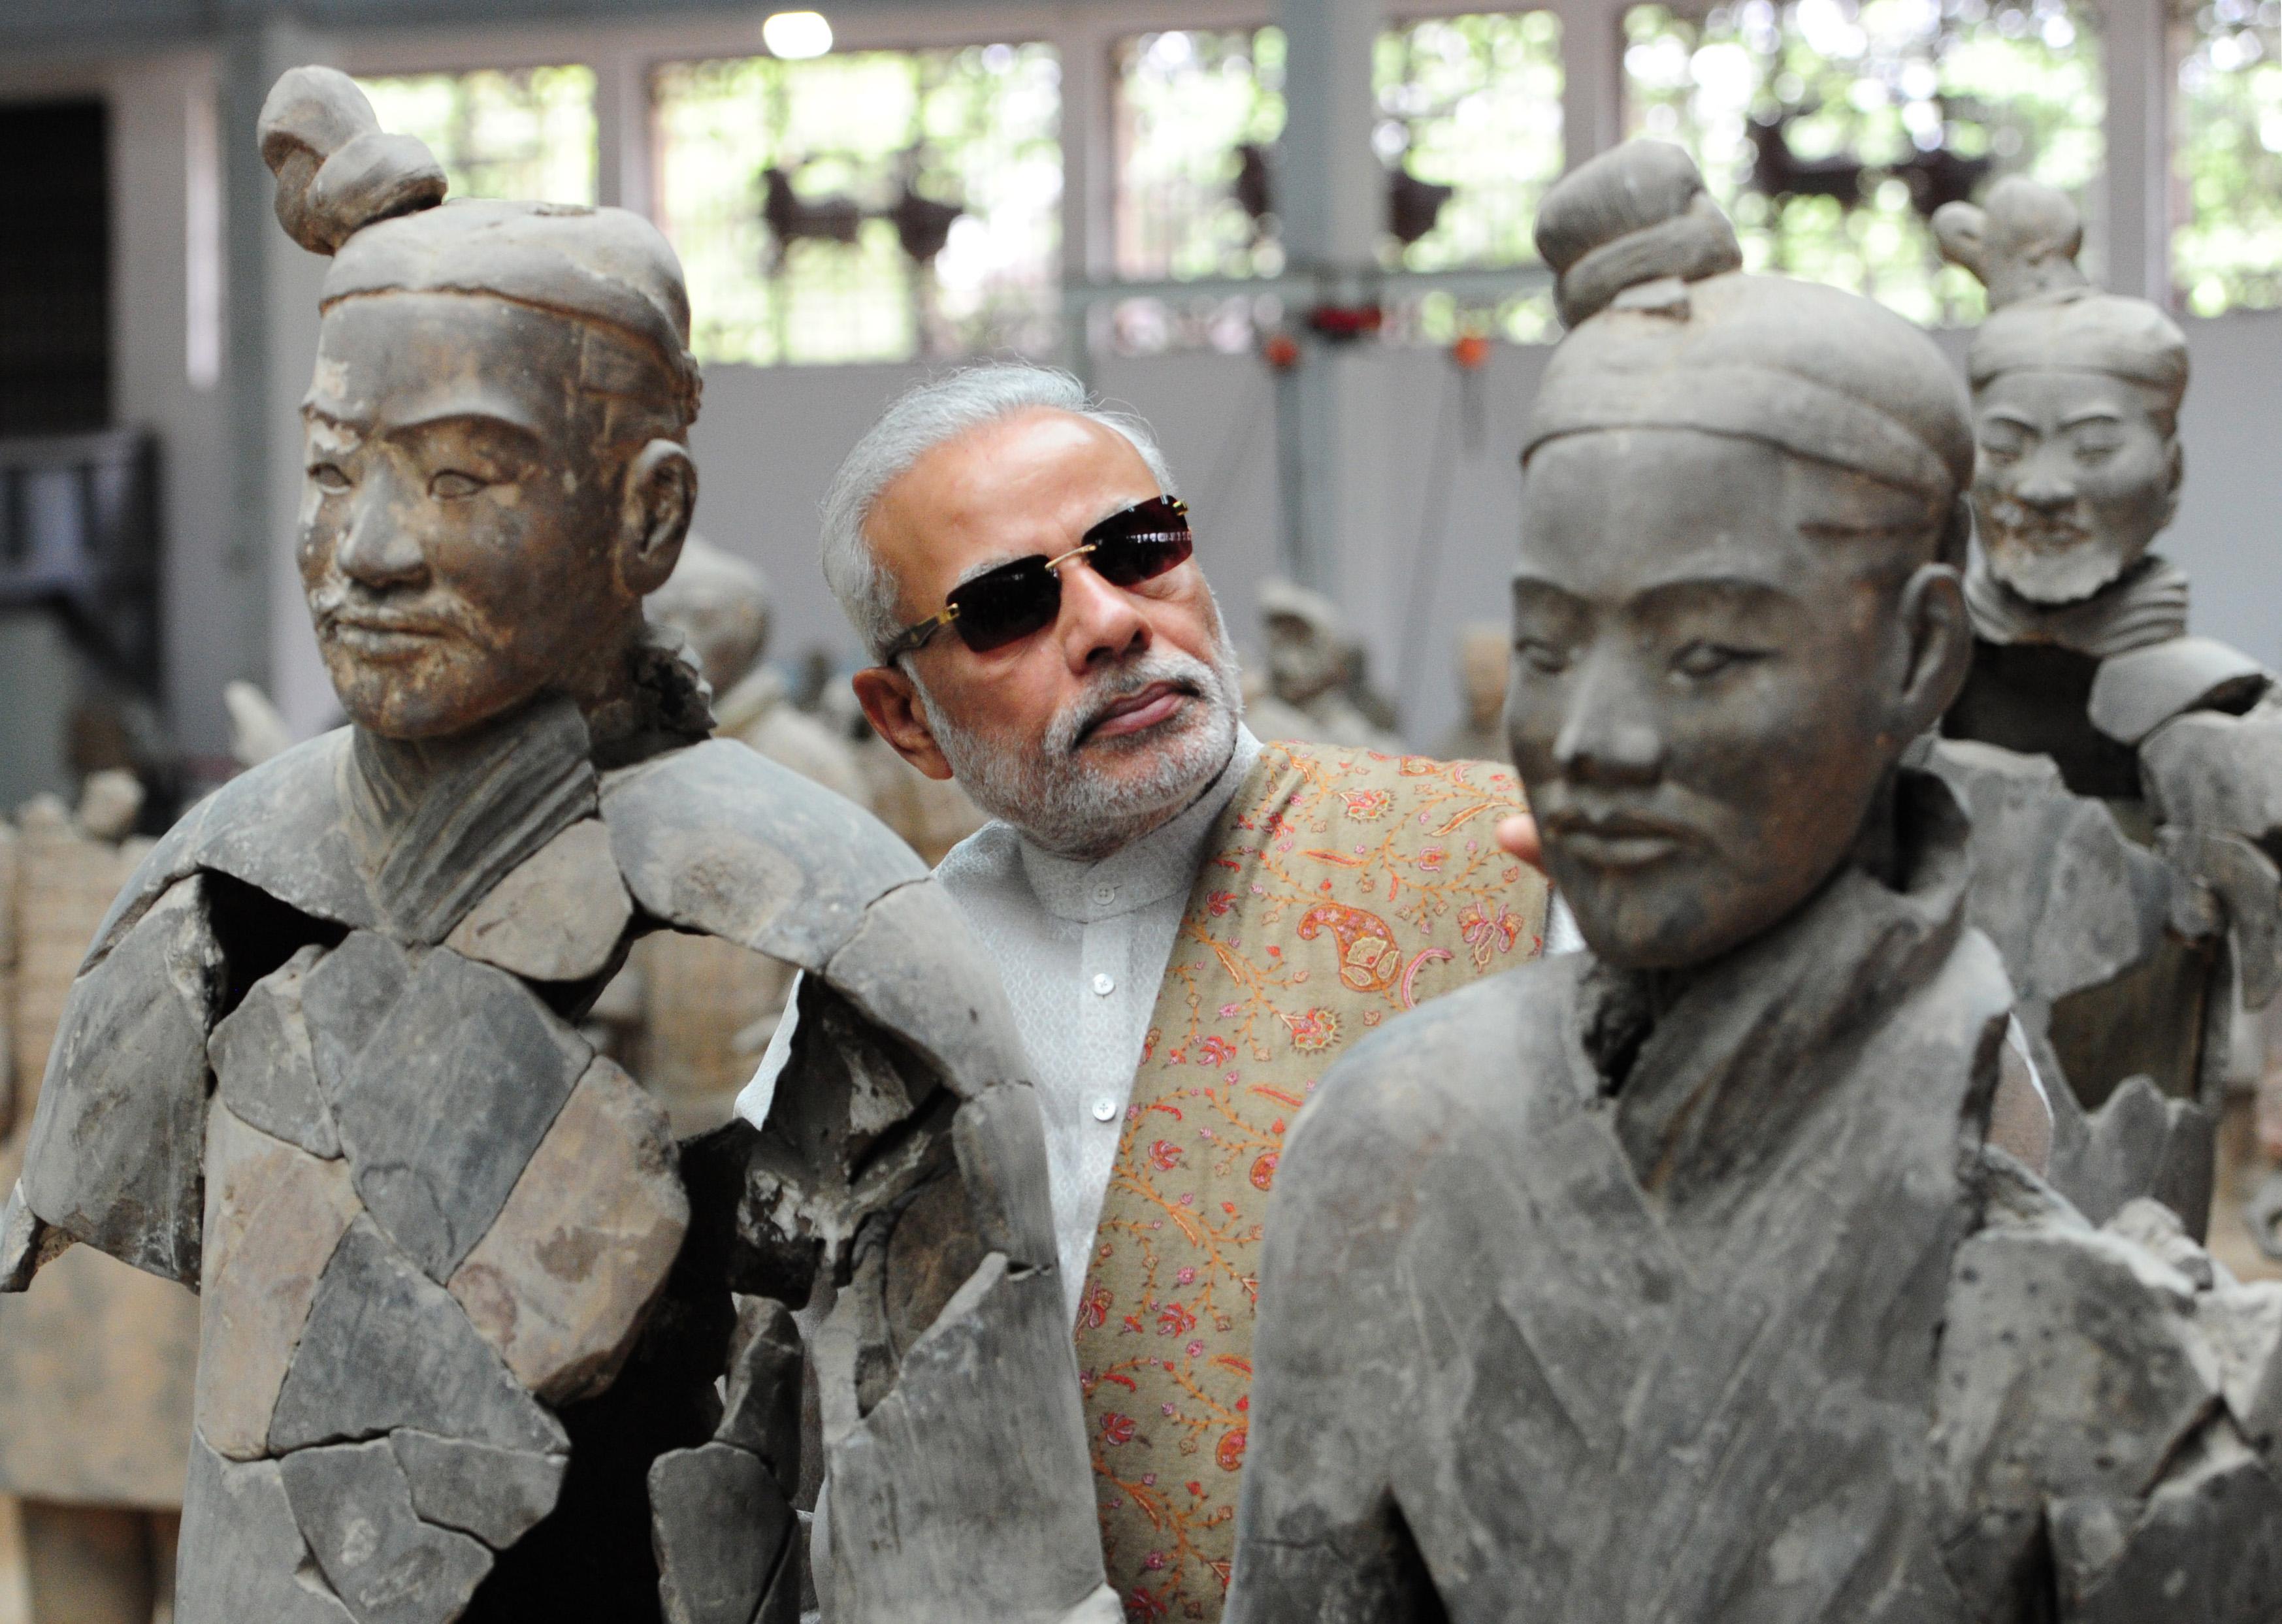 Prime Minister Narendra Modi in Xi'an, May 14, 2015. Credit: MEA